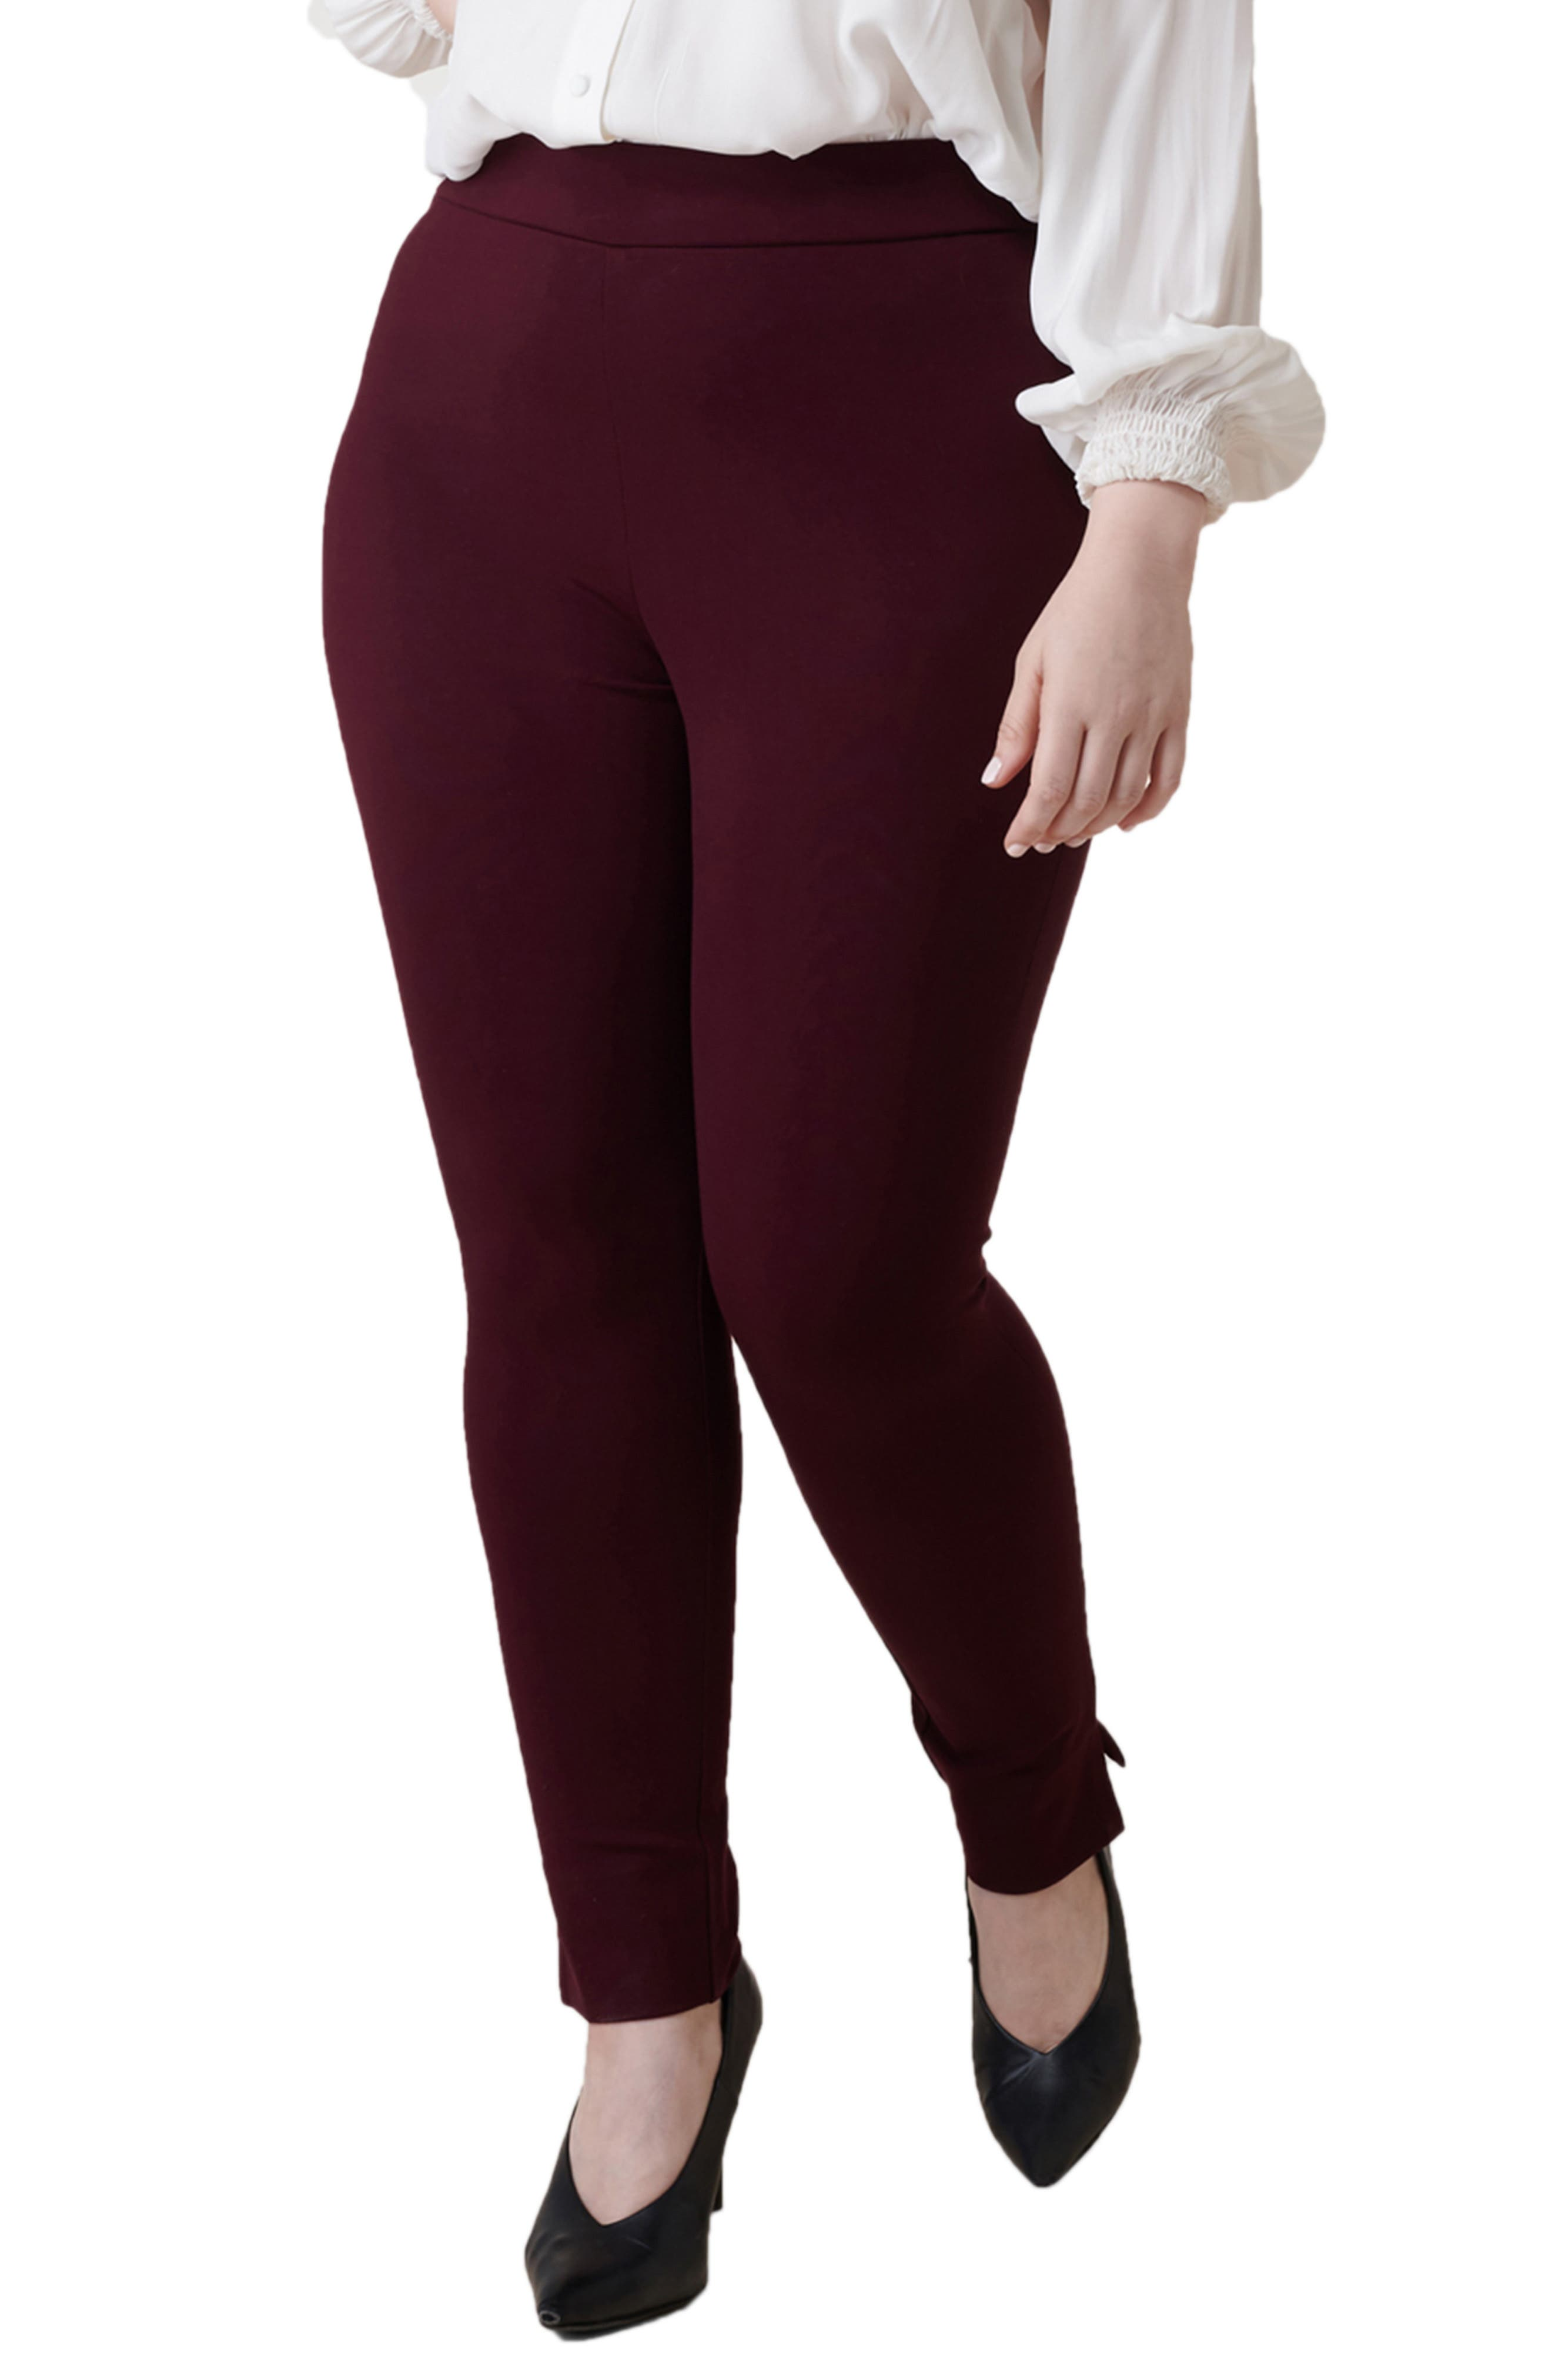 Skinny Compression Knit Pants